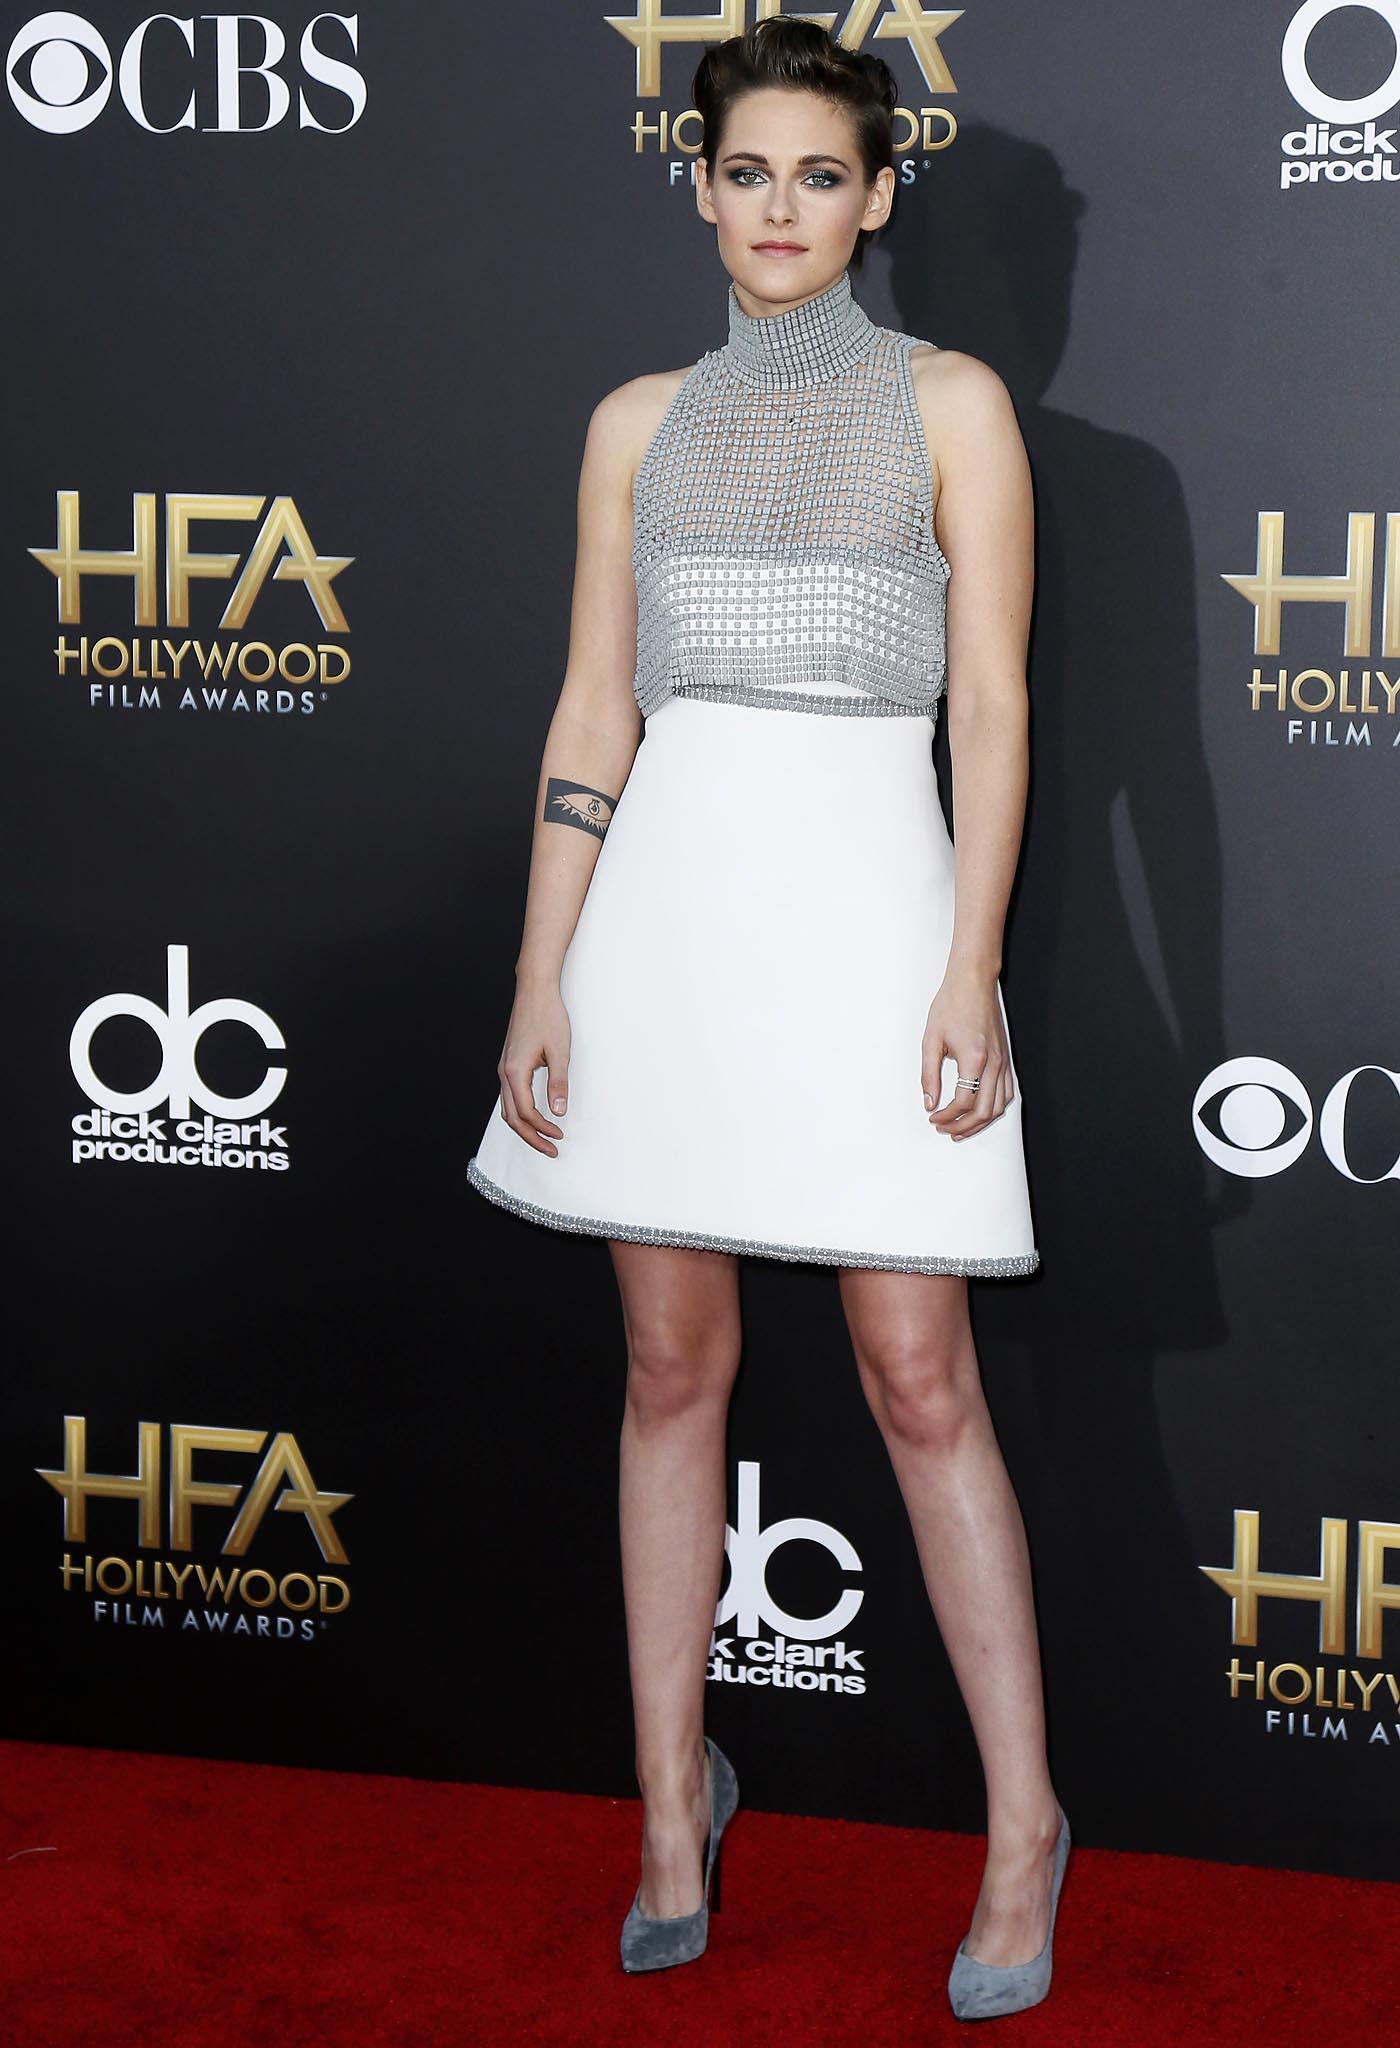 hollywood-film-awards-stewart1.jpg